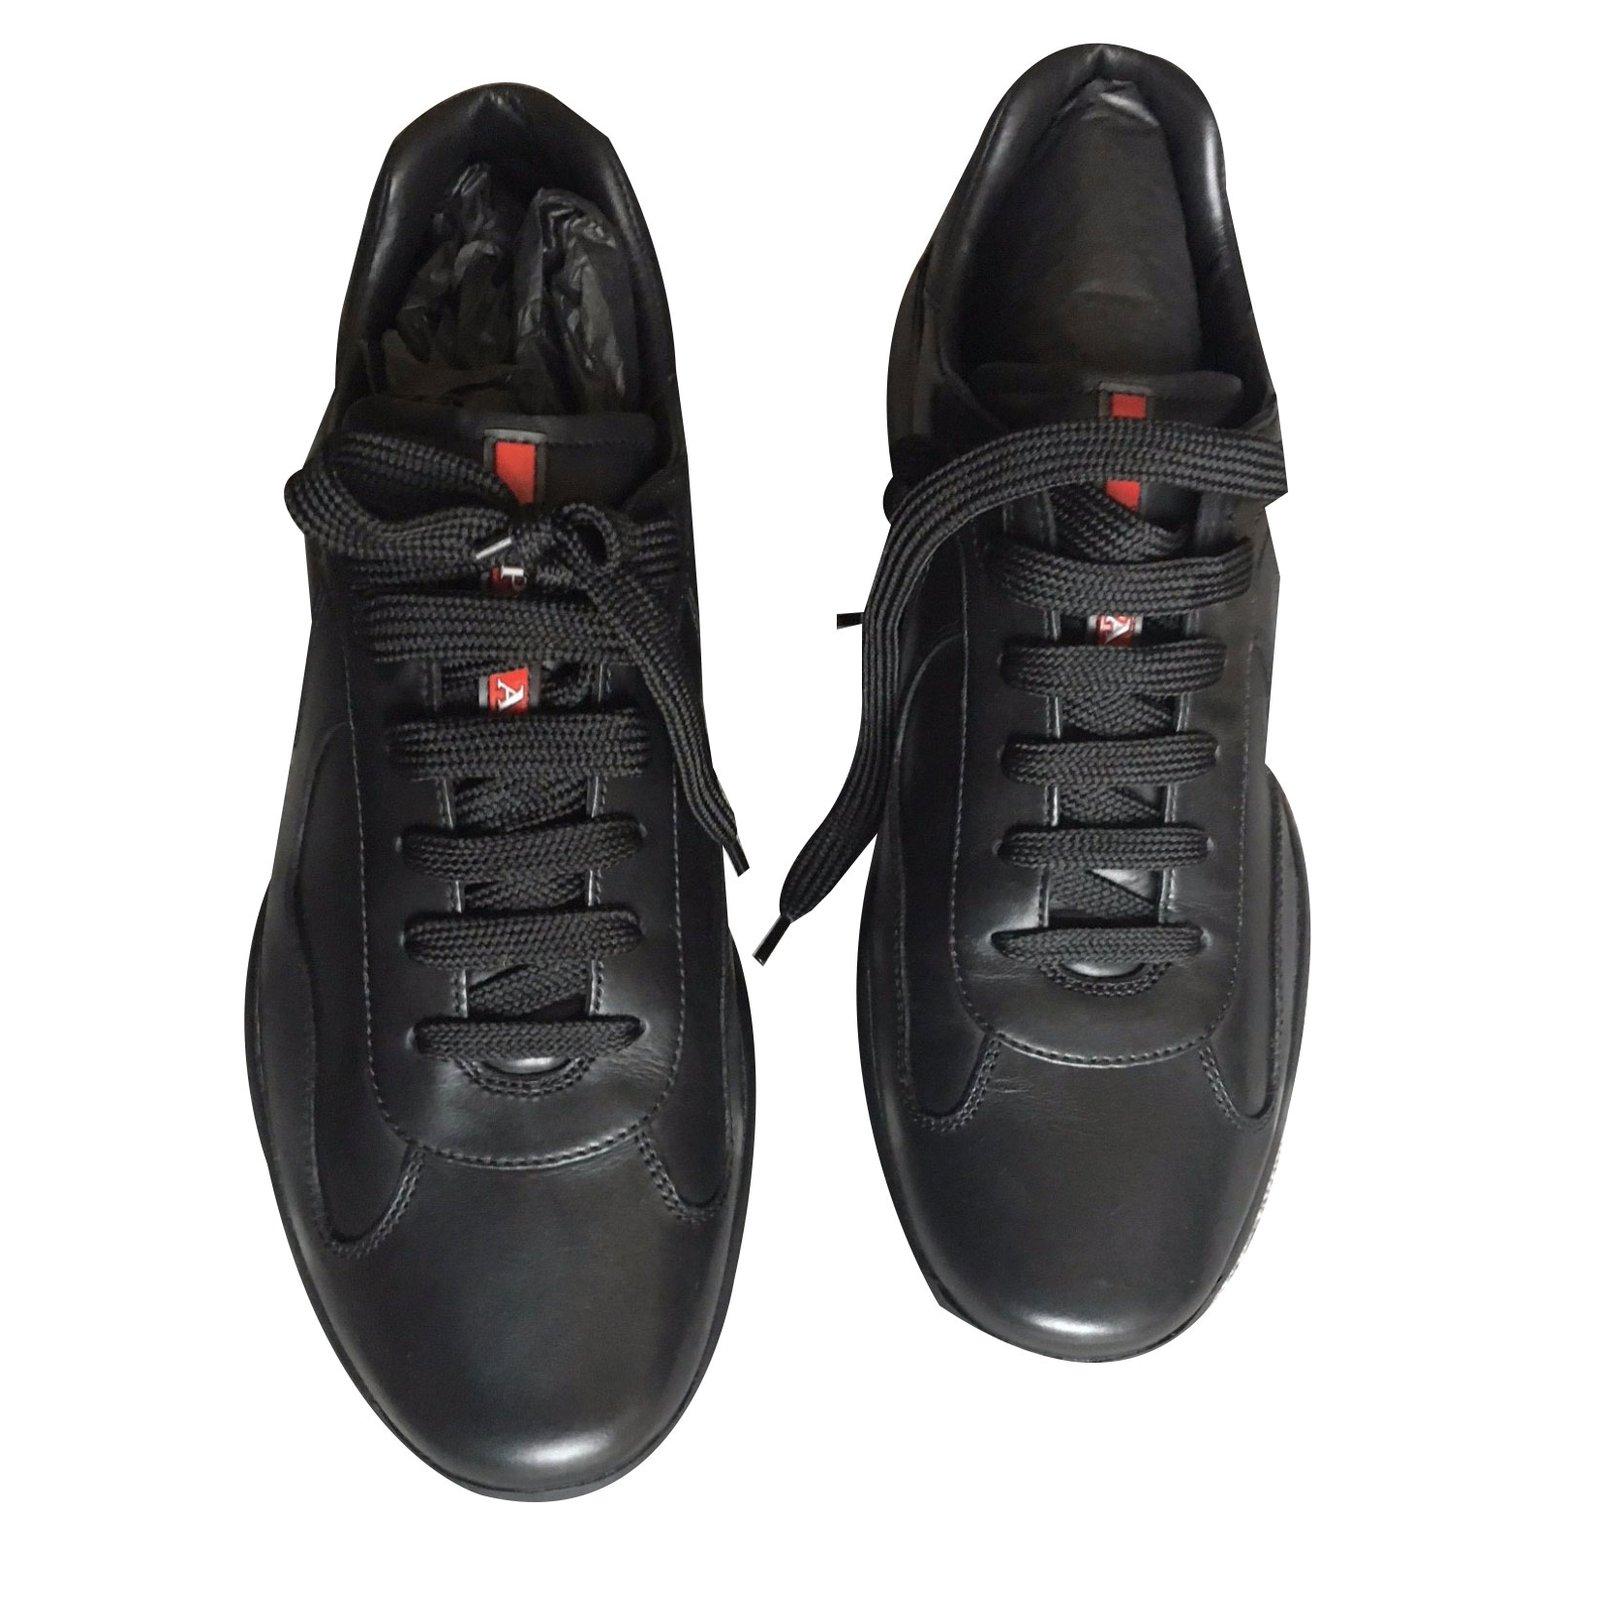 Prada Prada shoes new Sneakers Leather